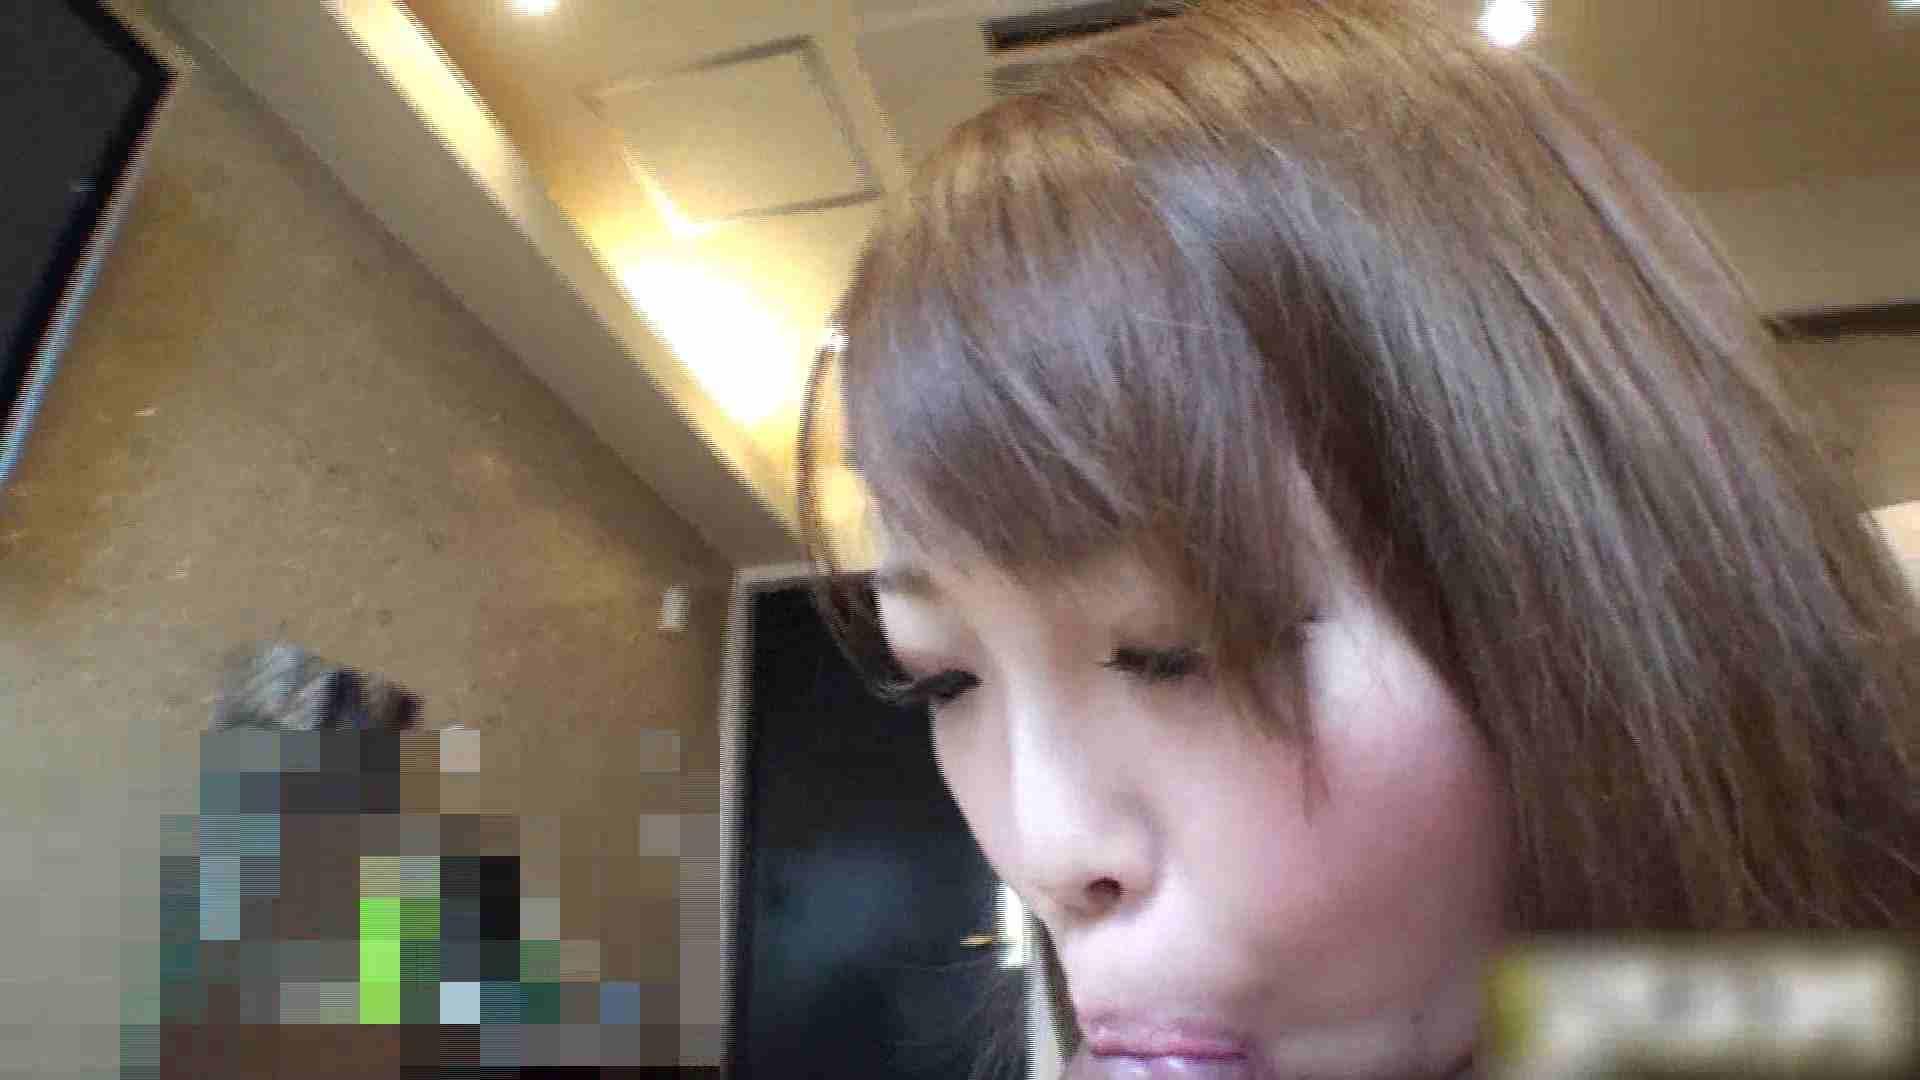 S級厳選美女ビッチガールVol.34 エッチなセックス  98画像 57